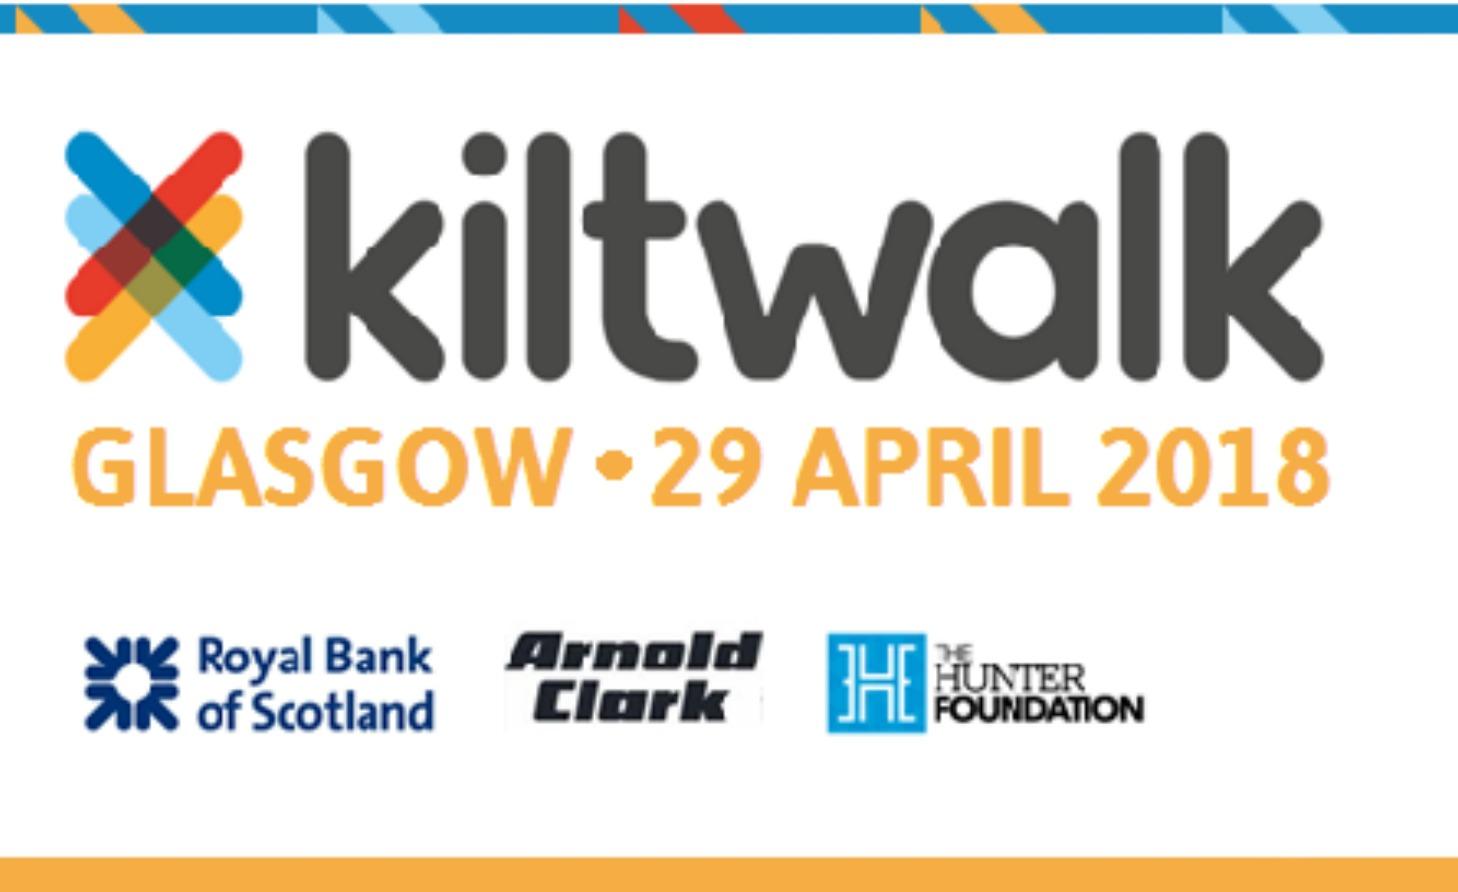 Glasgow Kiltwalk 2018